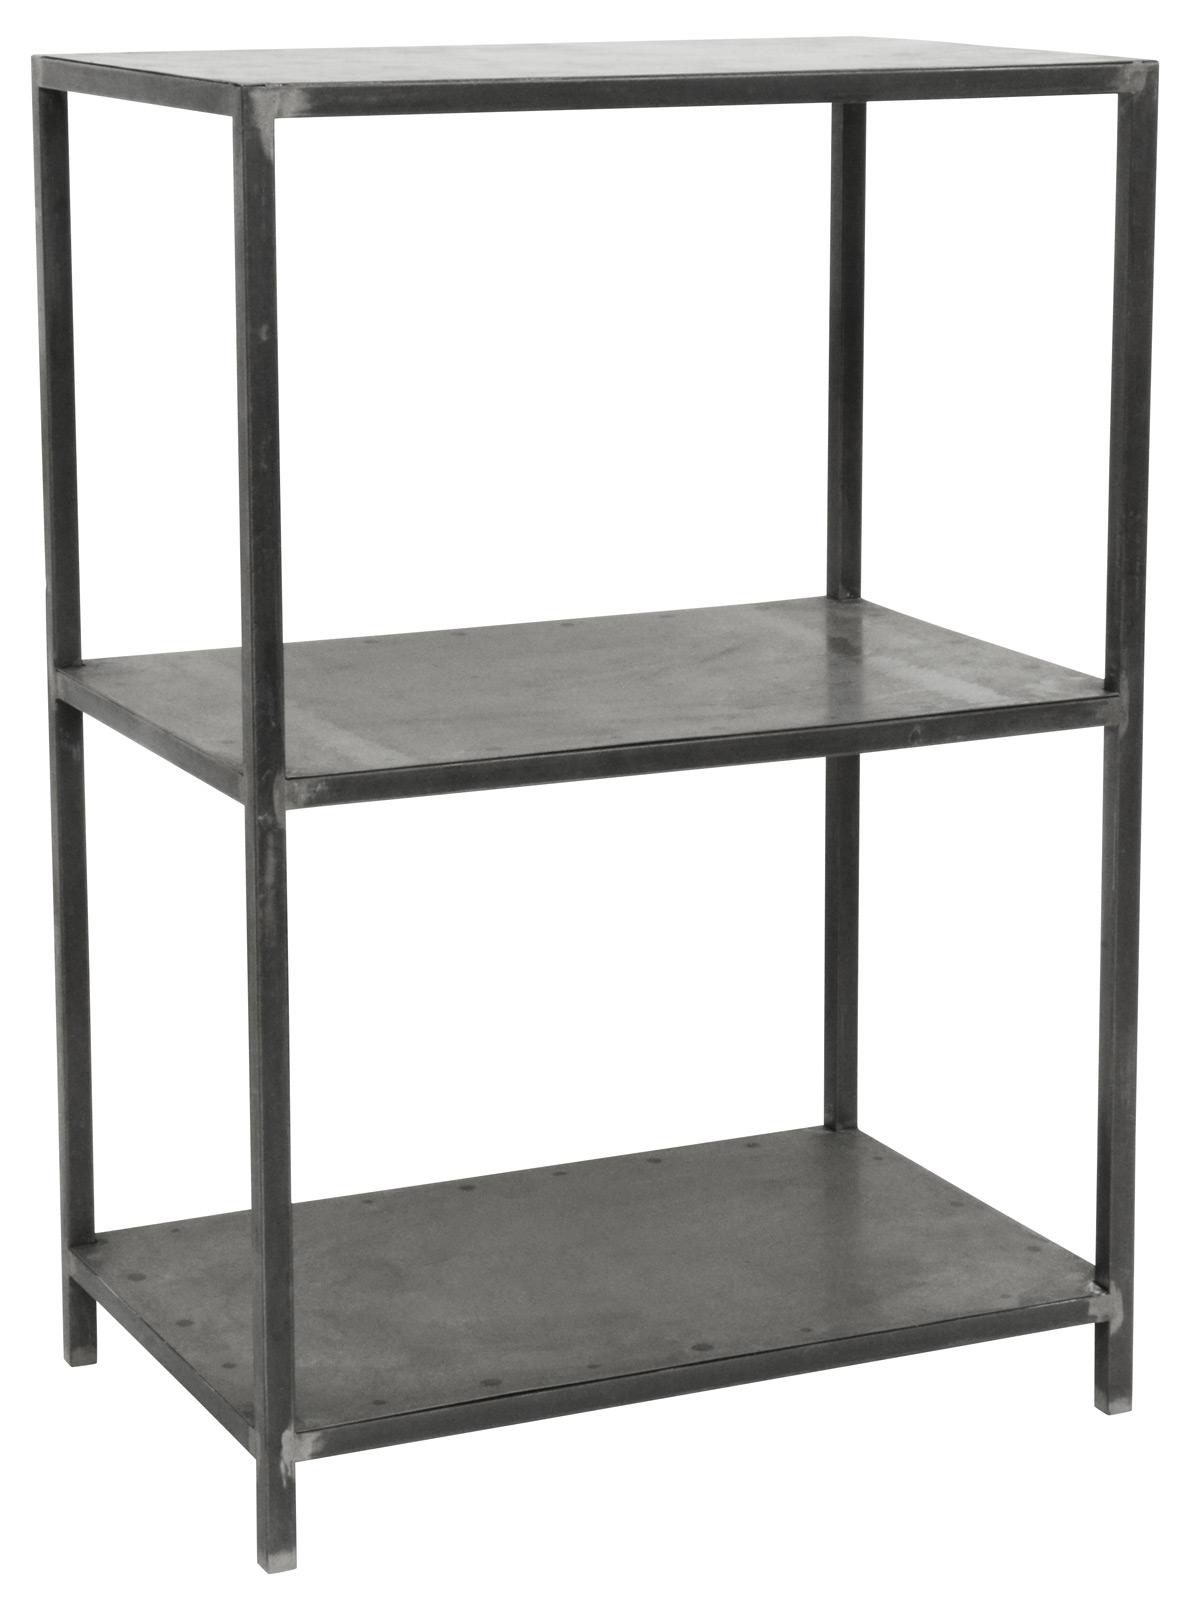 Image of   IB LAURSEN reol - grå metal, factory style, 2 hylder og 2 rum, max 10 kg pr. hylde, (90x40cm)